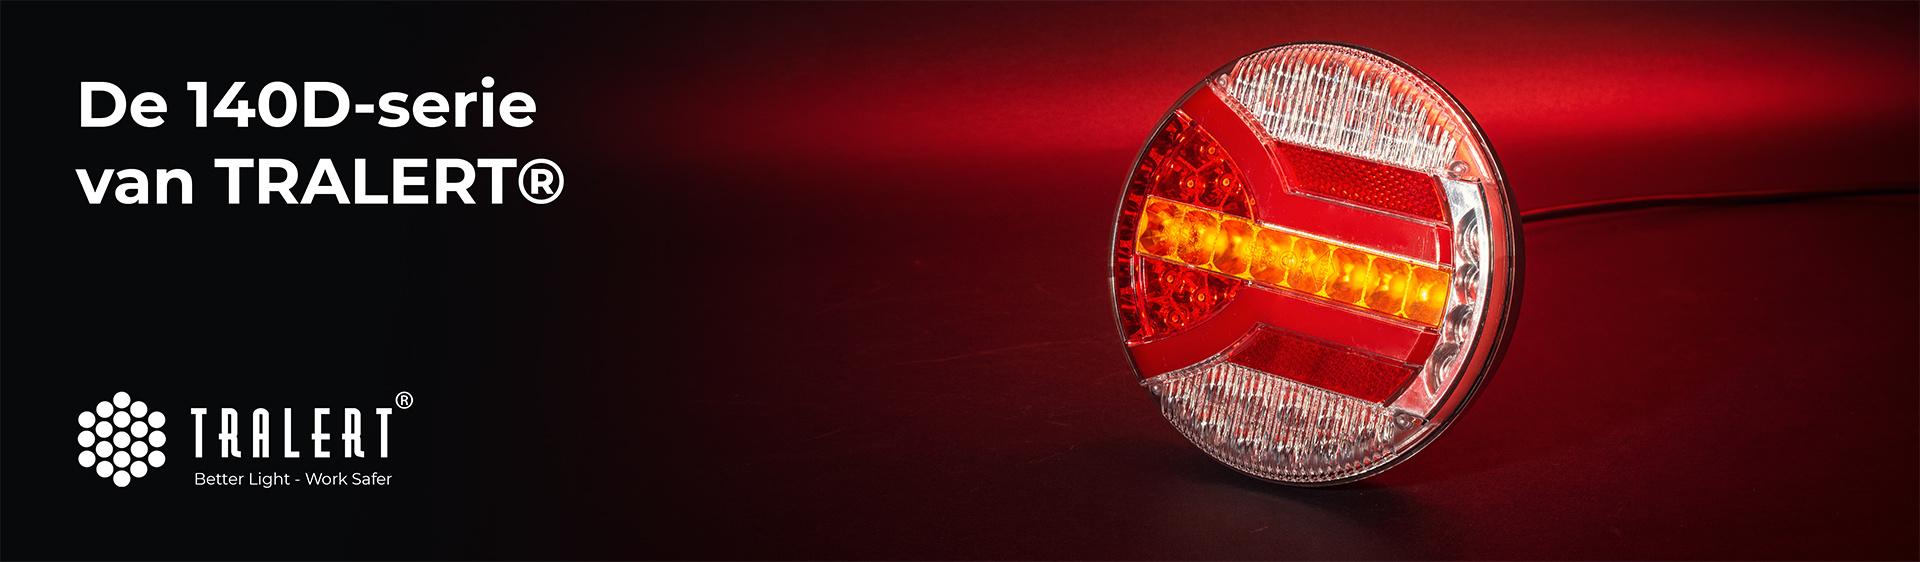 Tralert 140D-serie LED achterlichten